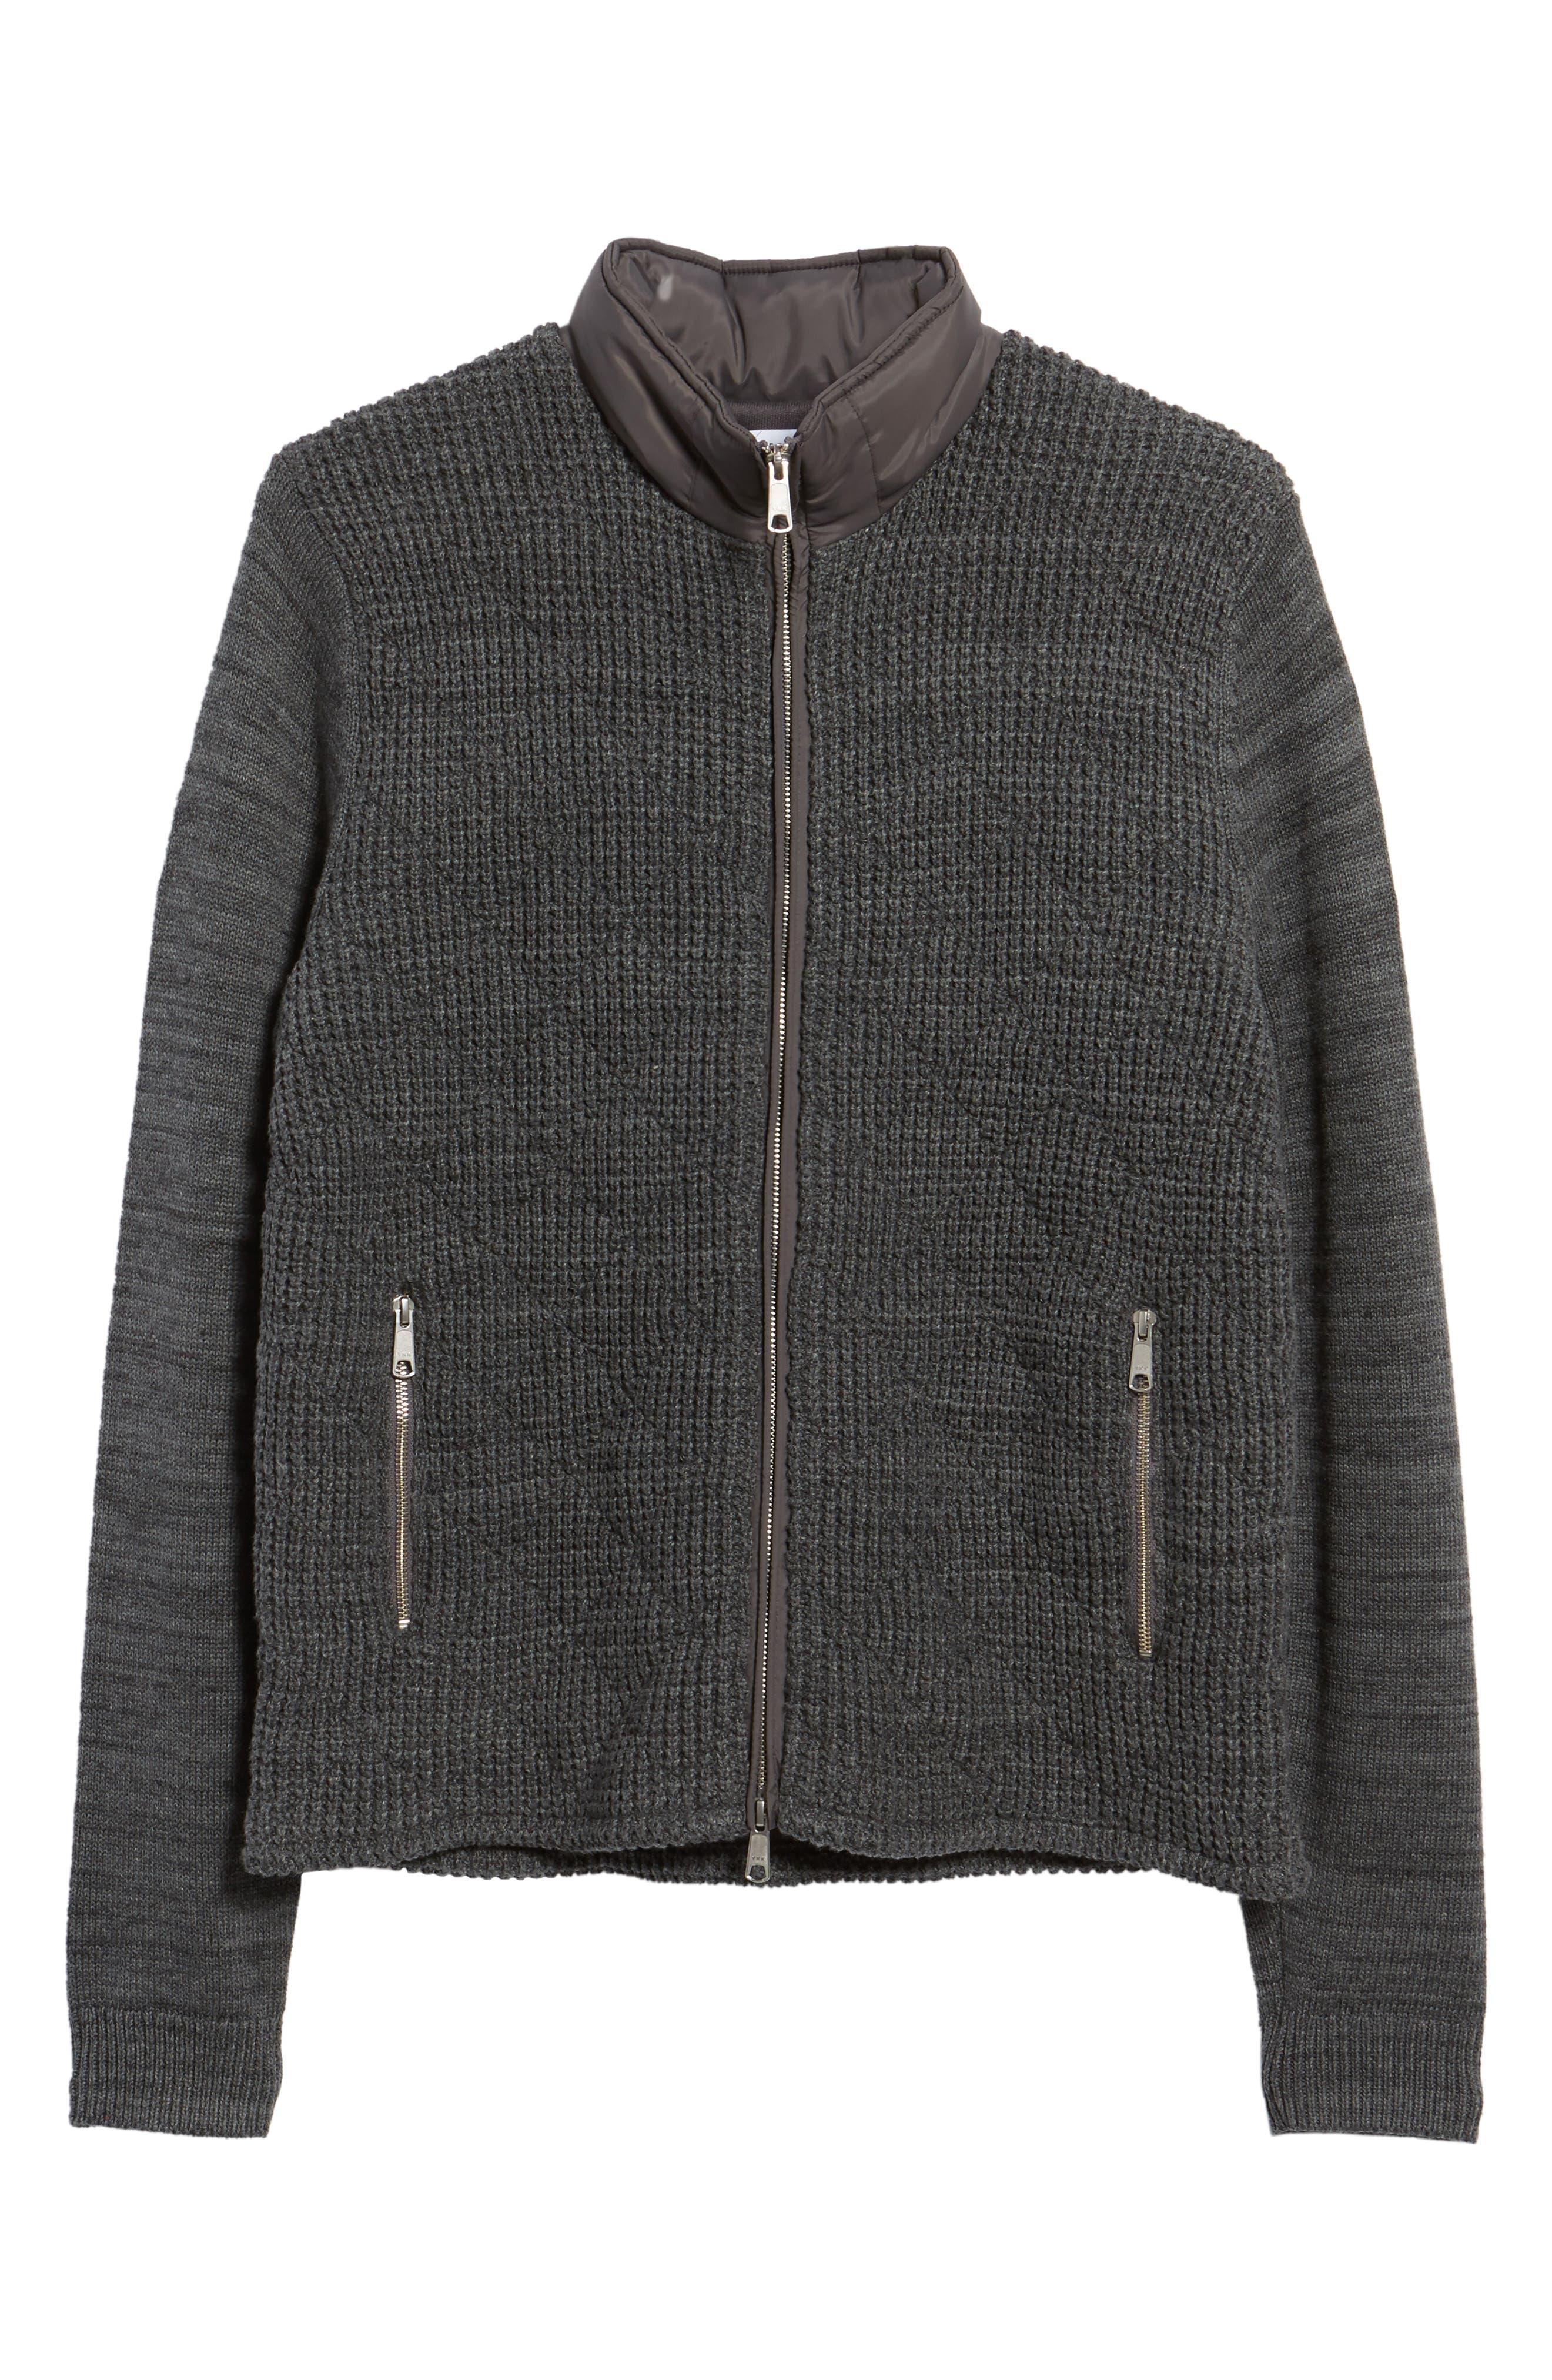 Mixed Media Full Zip Sweater,                             Alternate thumbnail 6, color,                             Grey Dark Charcoal Spacedye